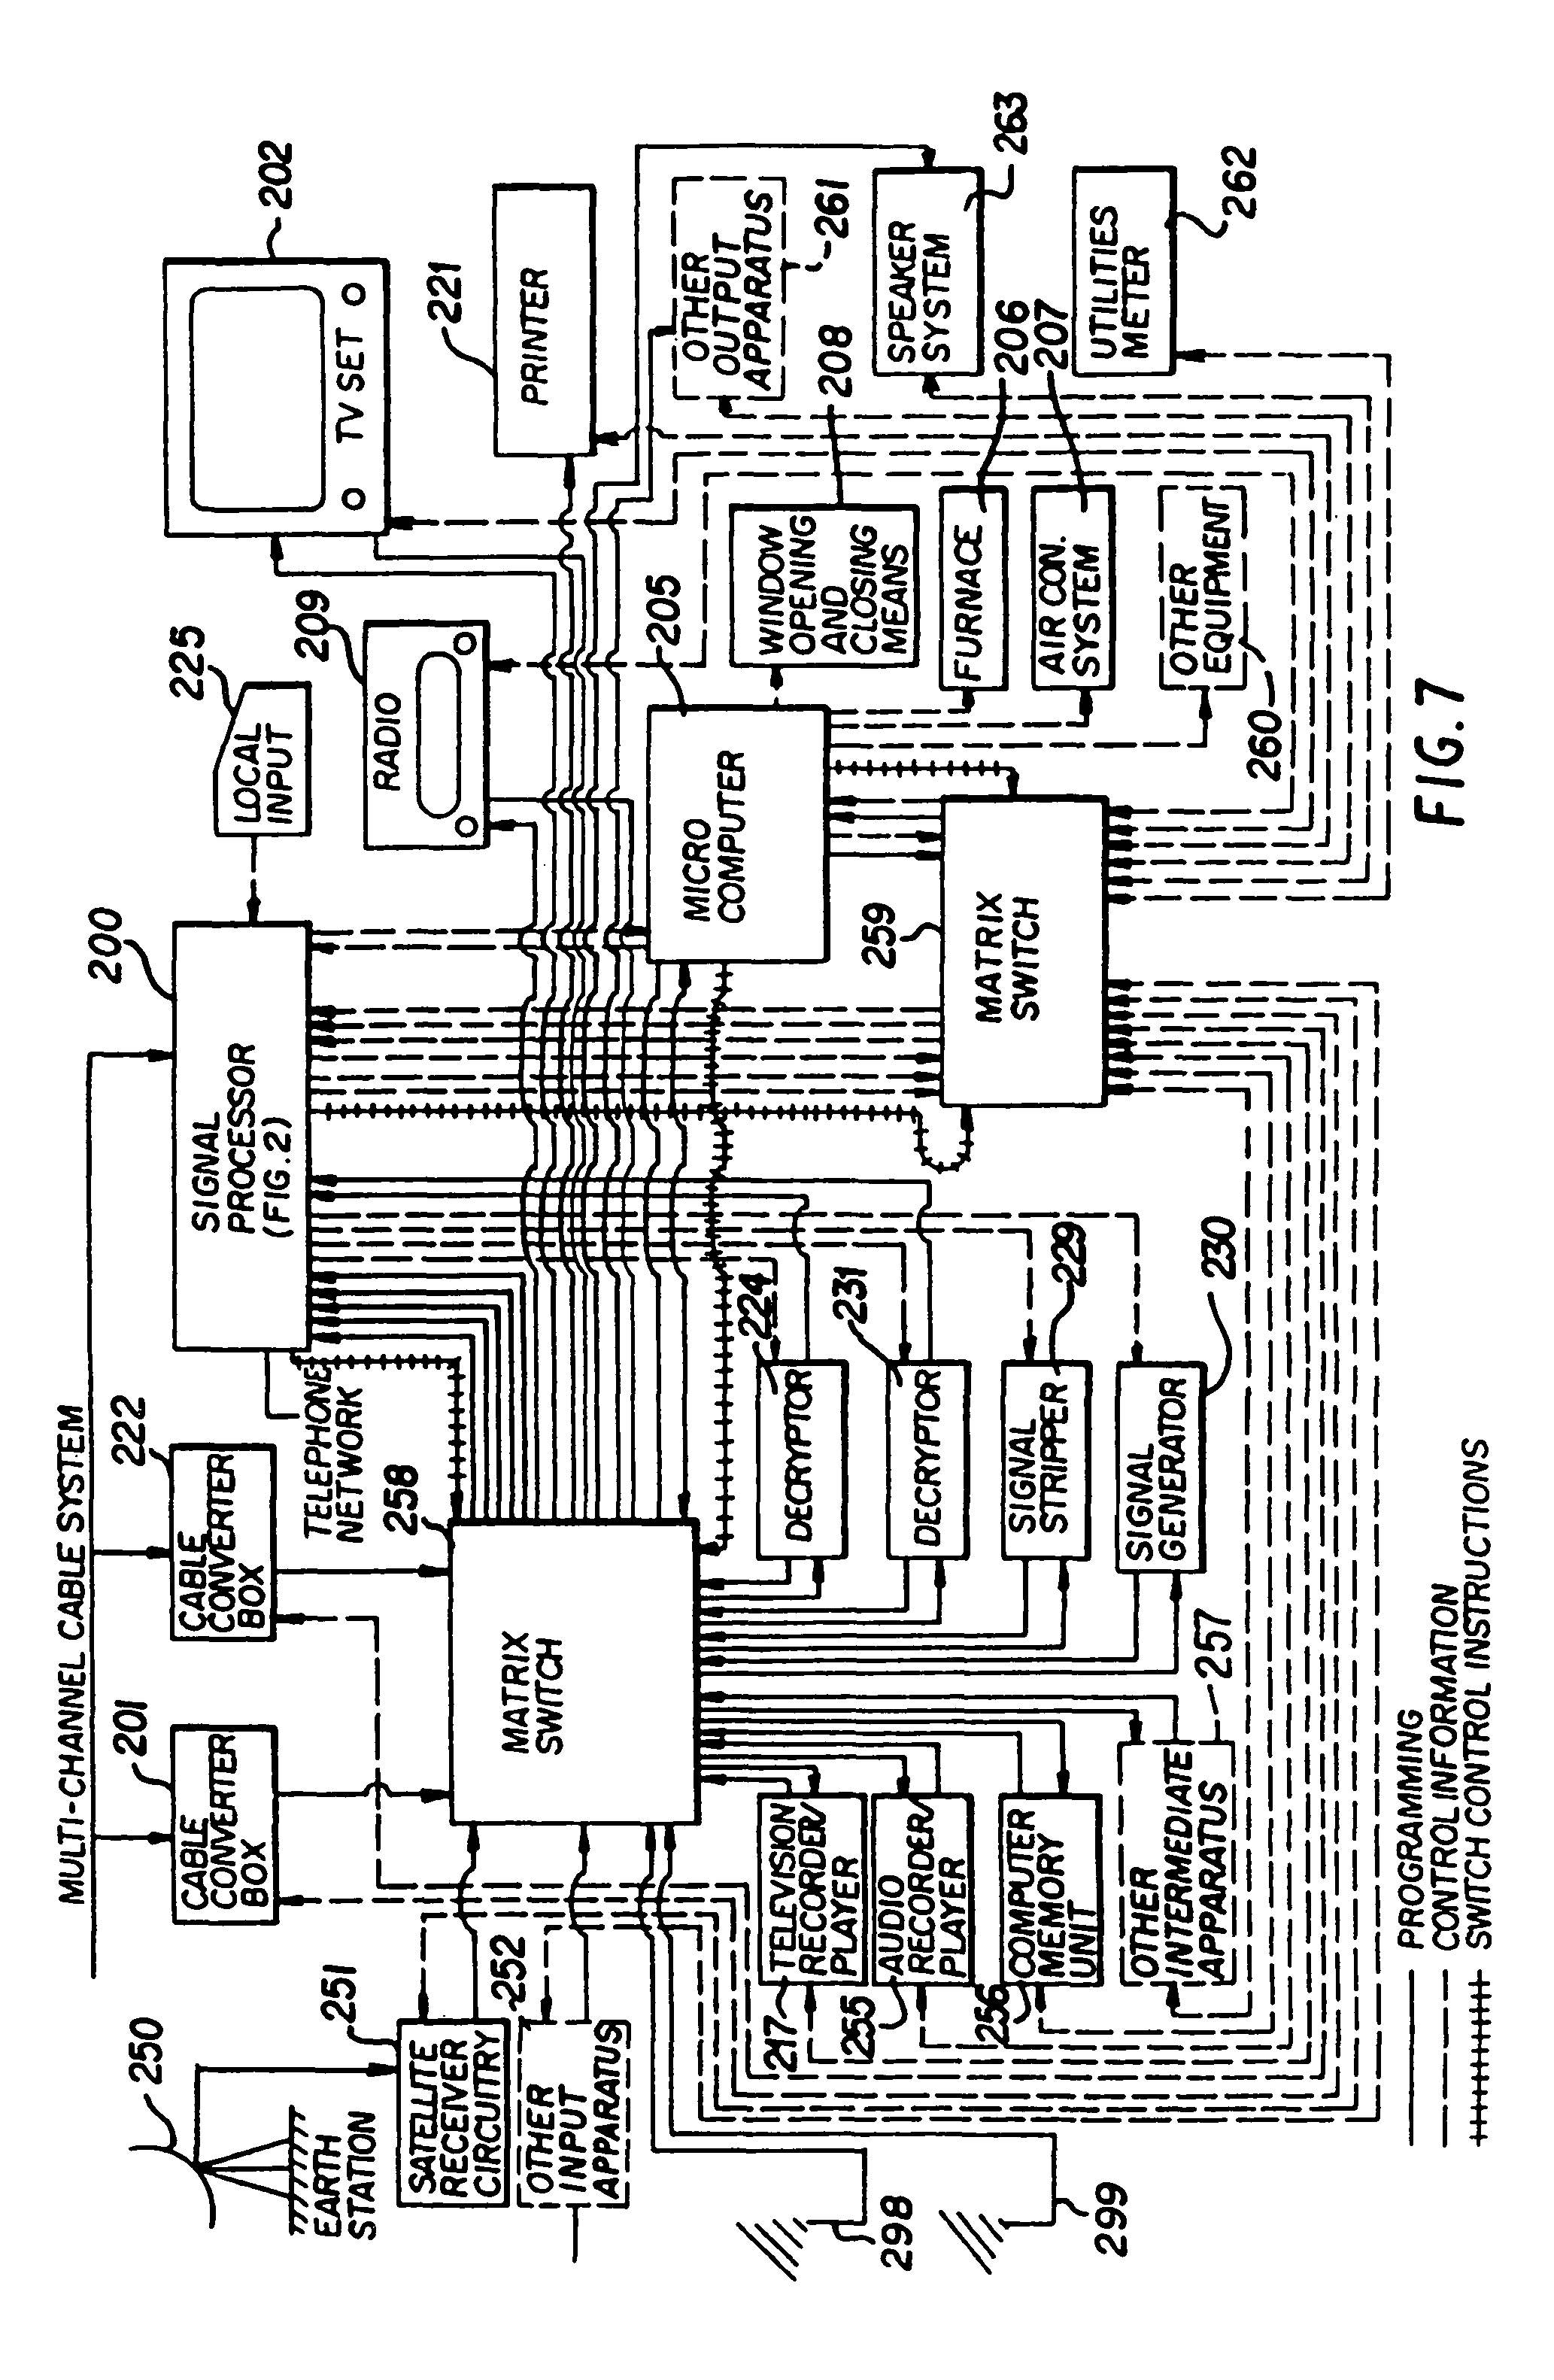 Patent US 7,752,649 B1